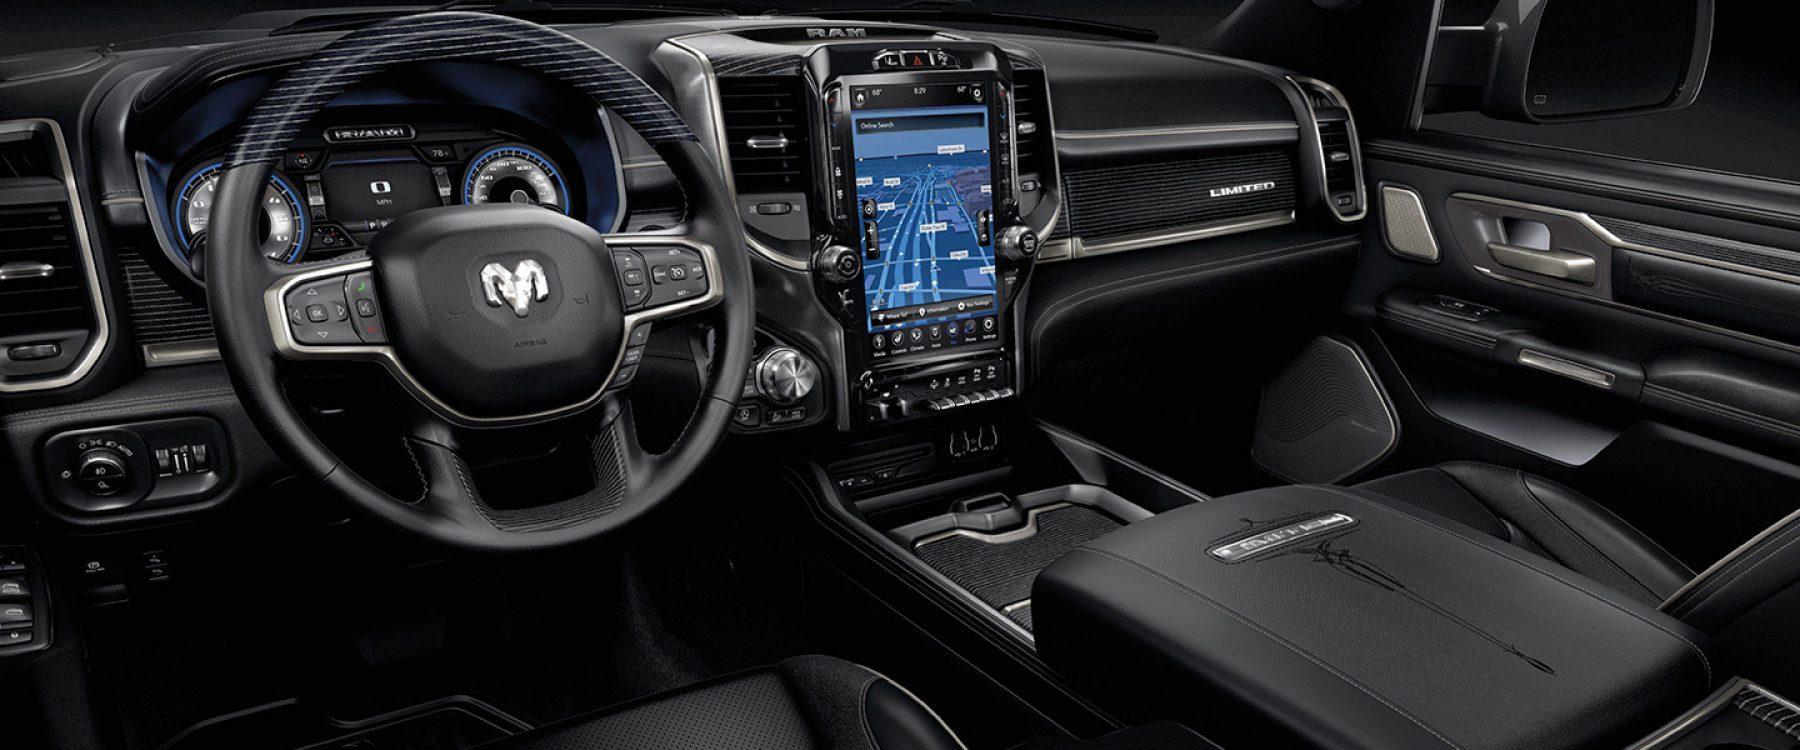 2019 Ram 1500 Interior Seats Limited black